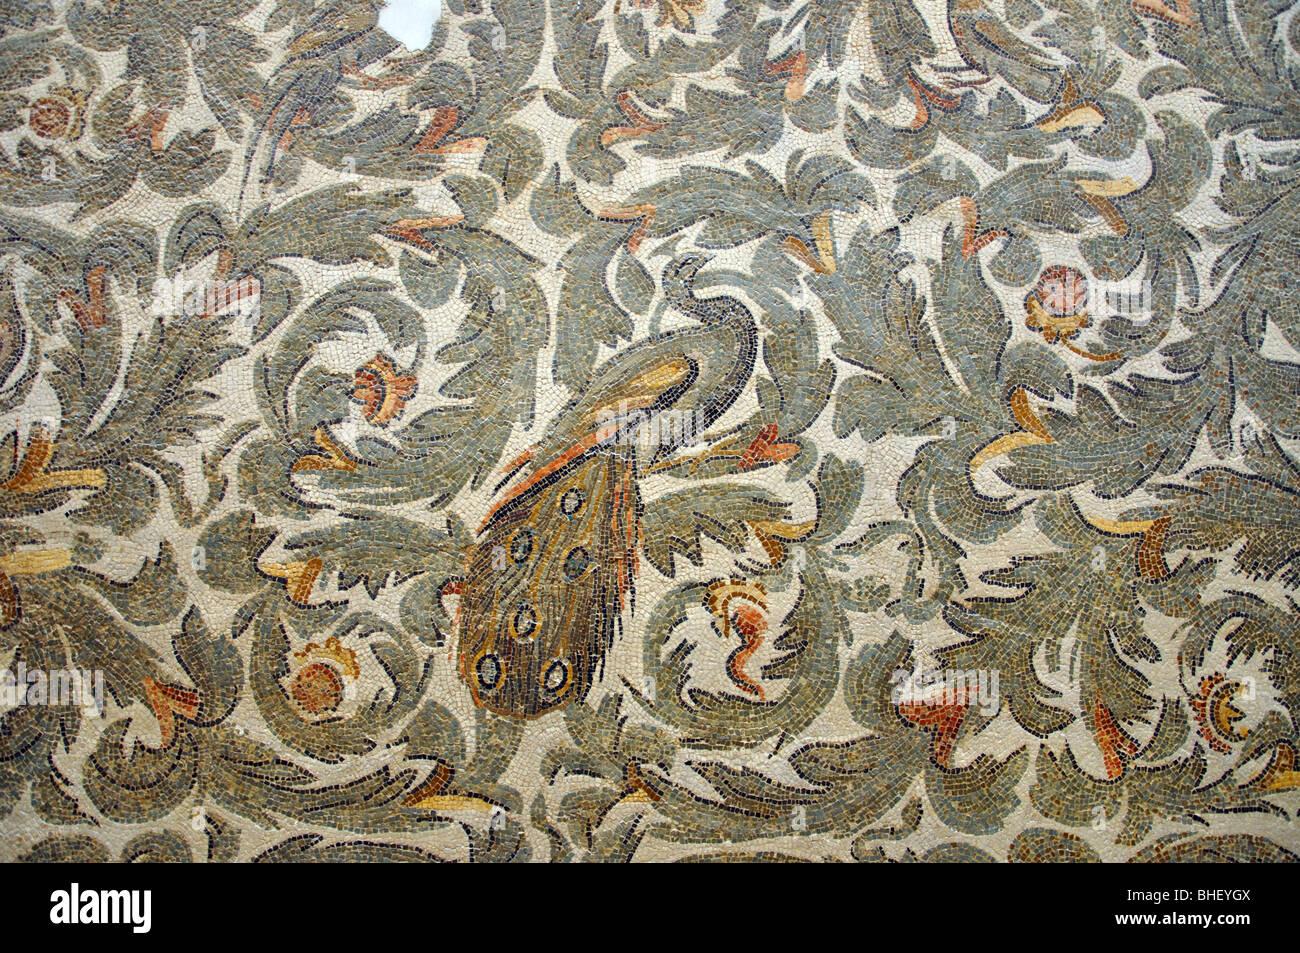 Mosaic de Frigidarium, The Bardo National Museum, Le Bardo District, Tunis, Tunis Governorate, Tunisia Stock Photo